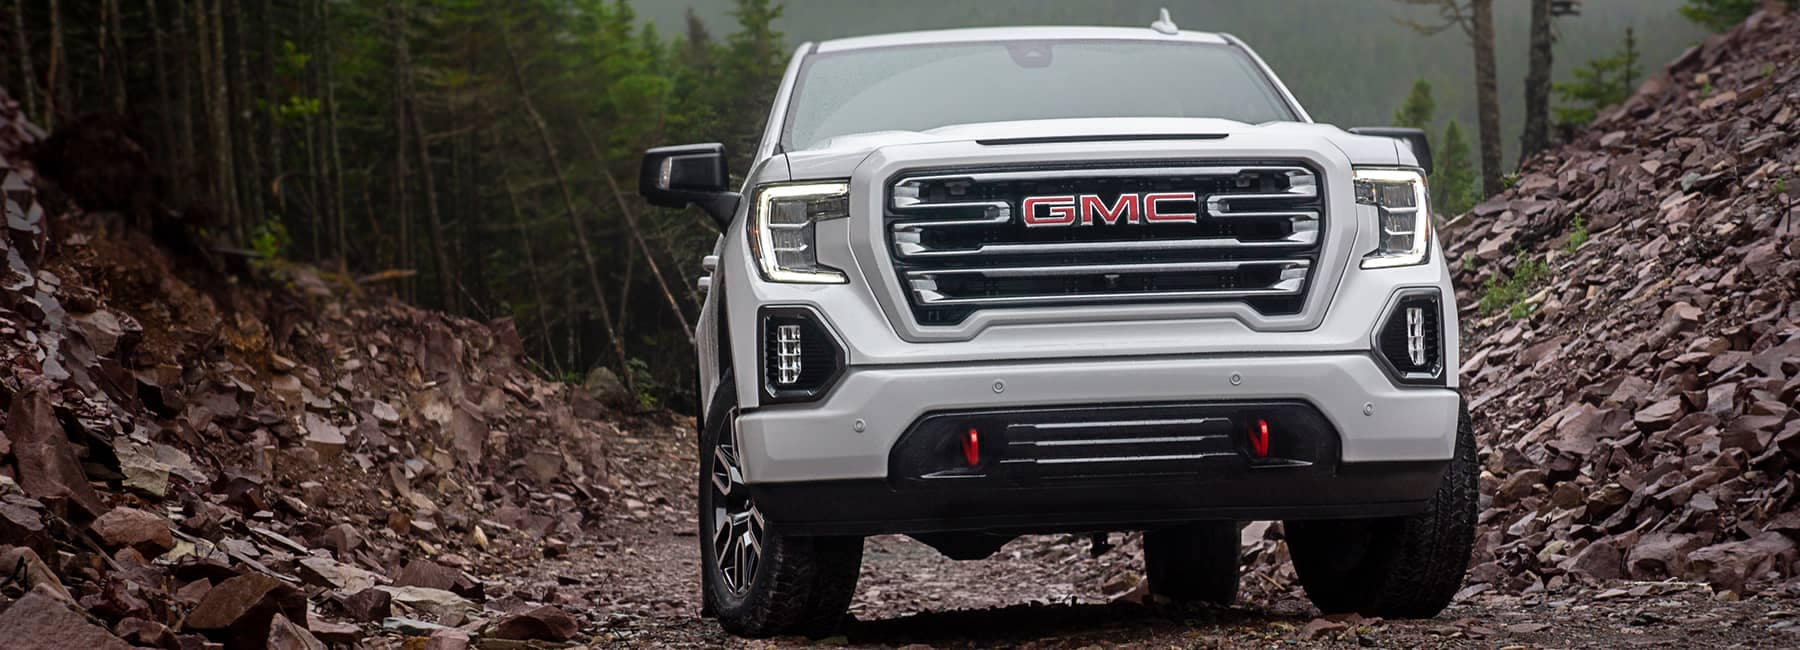 GMC Sierra White Front